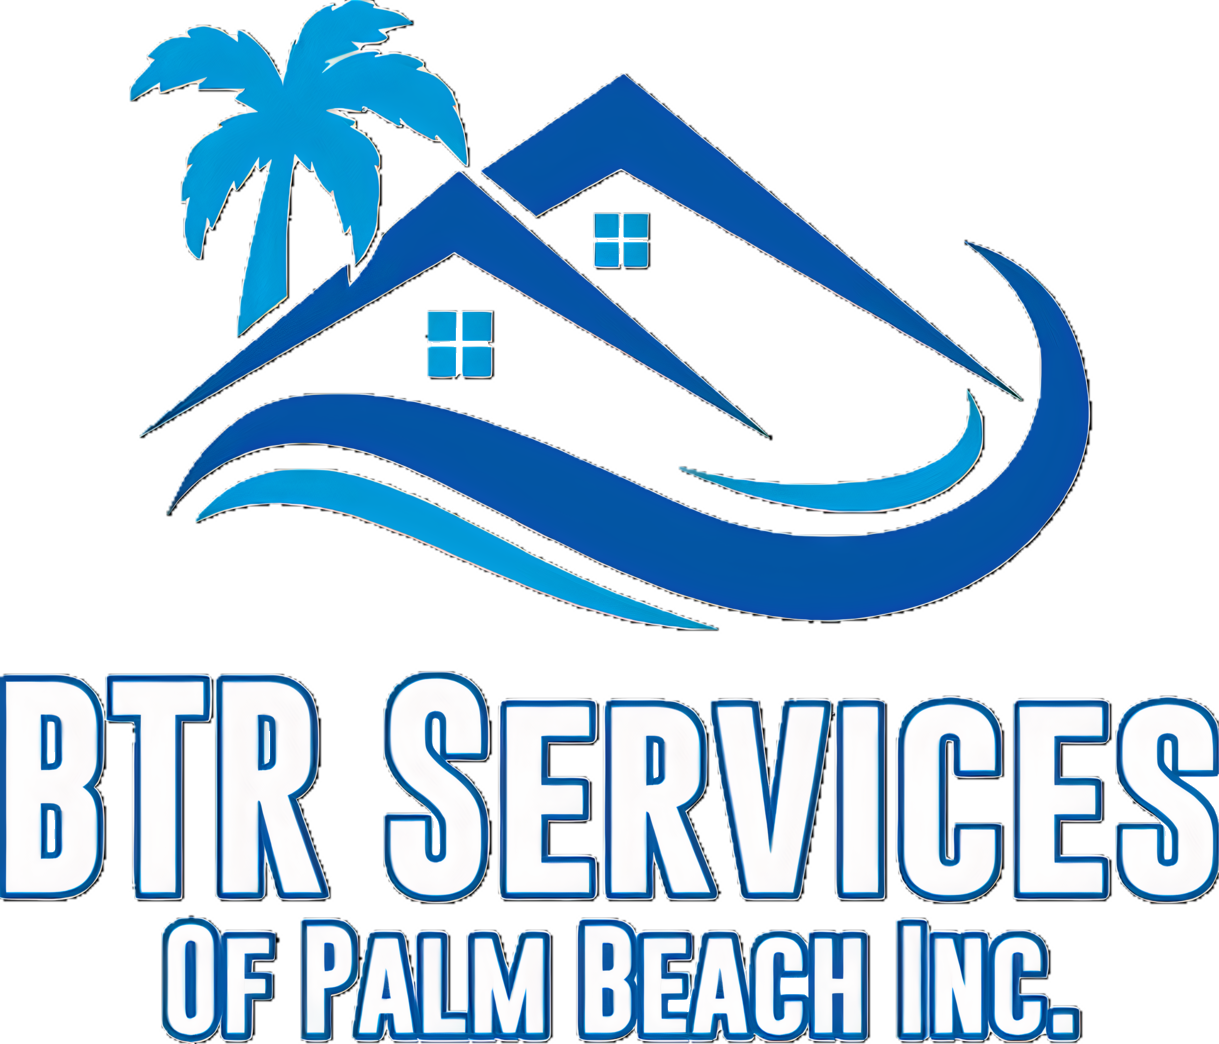 BTR Services of Palm Beach